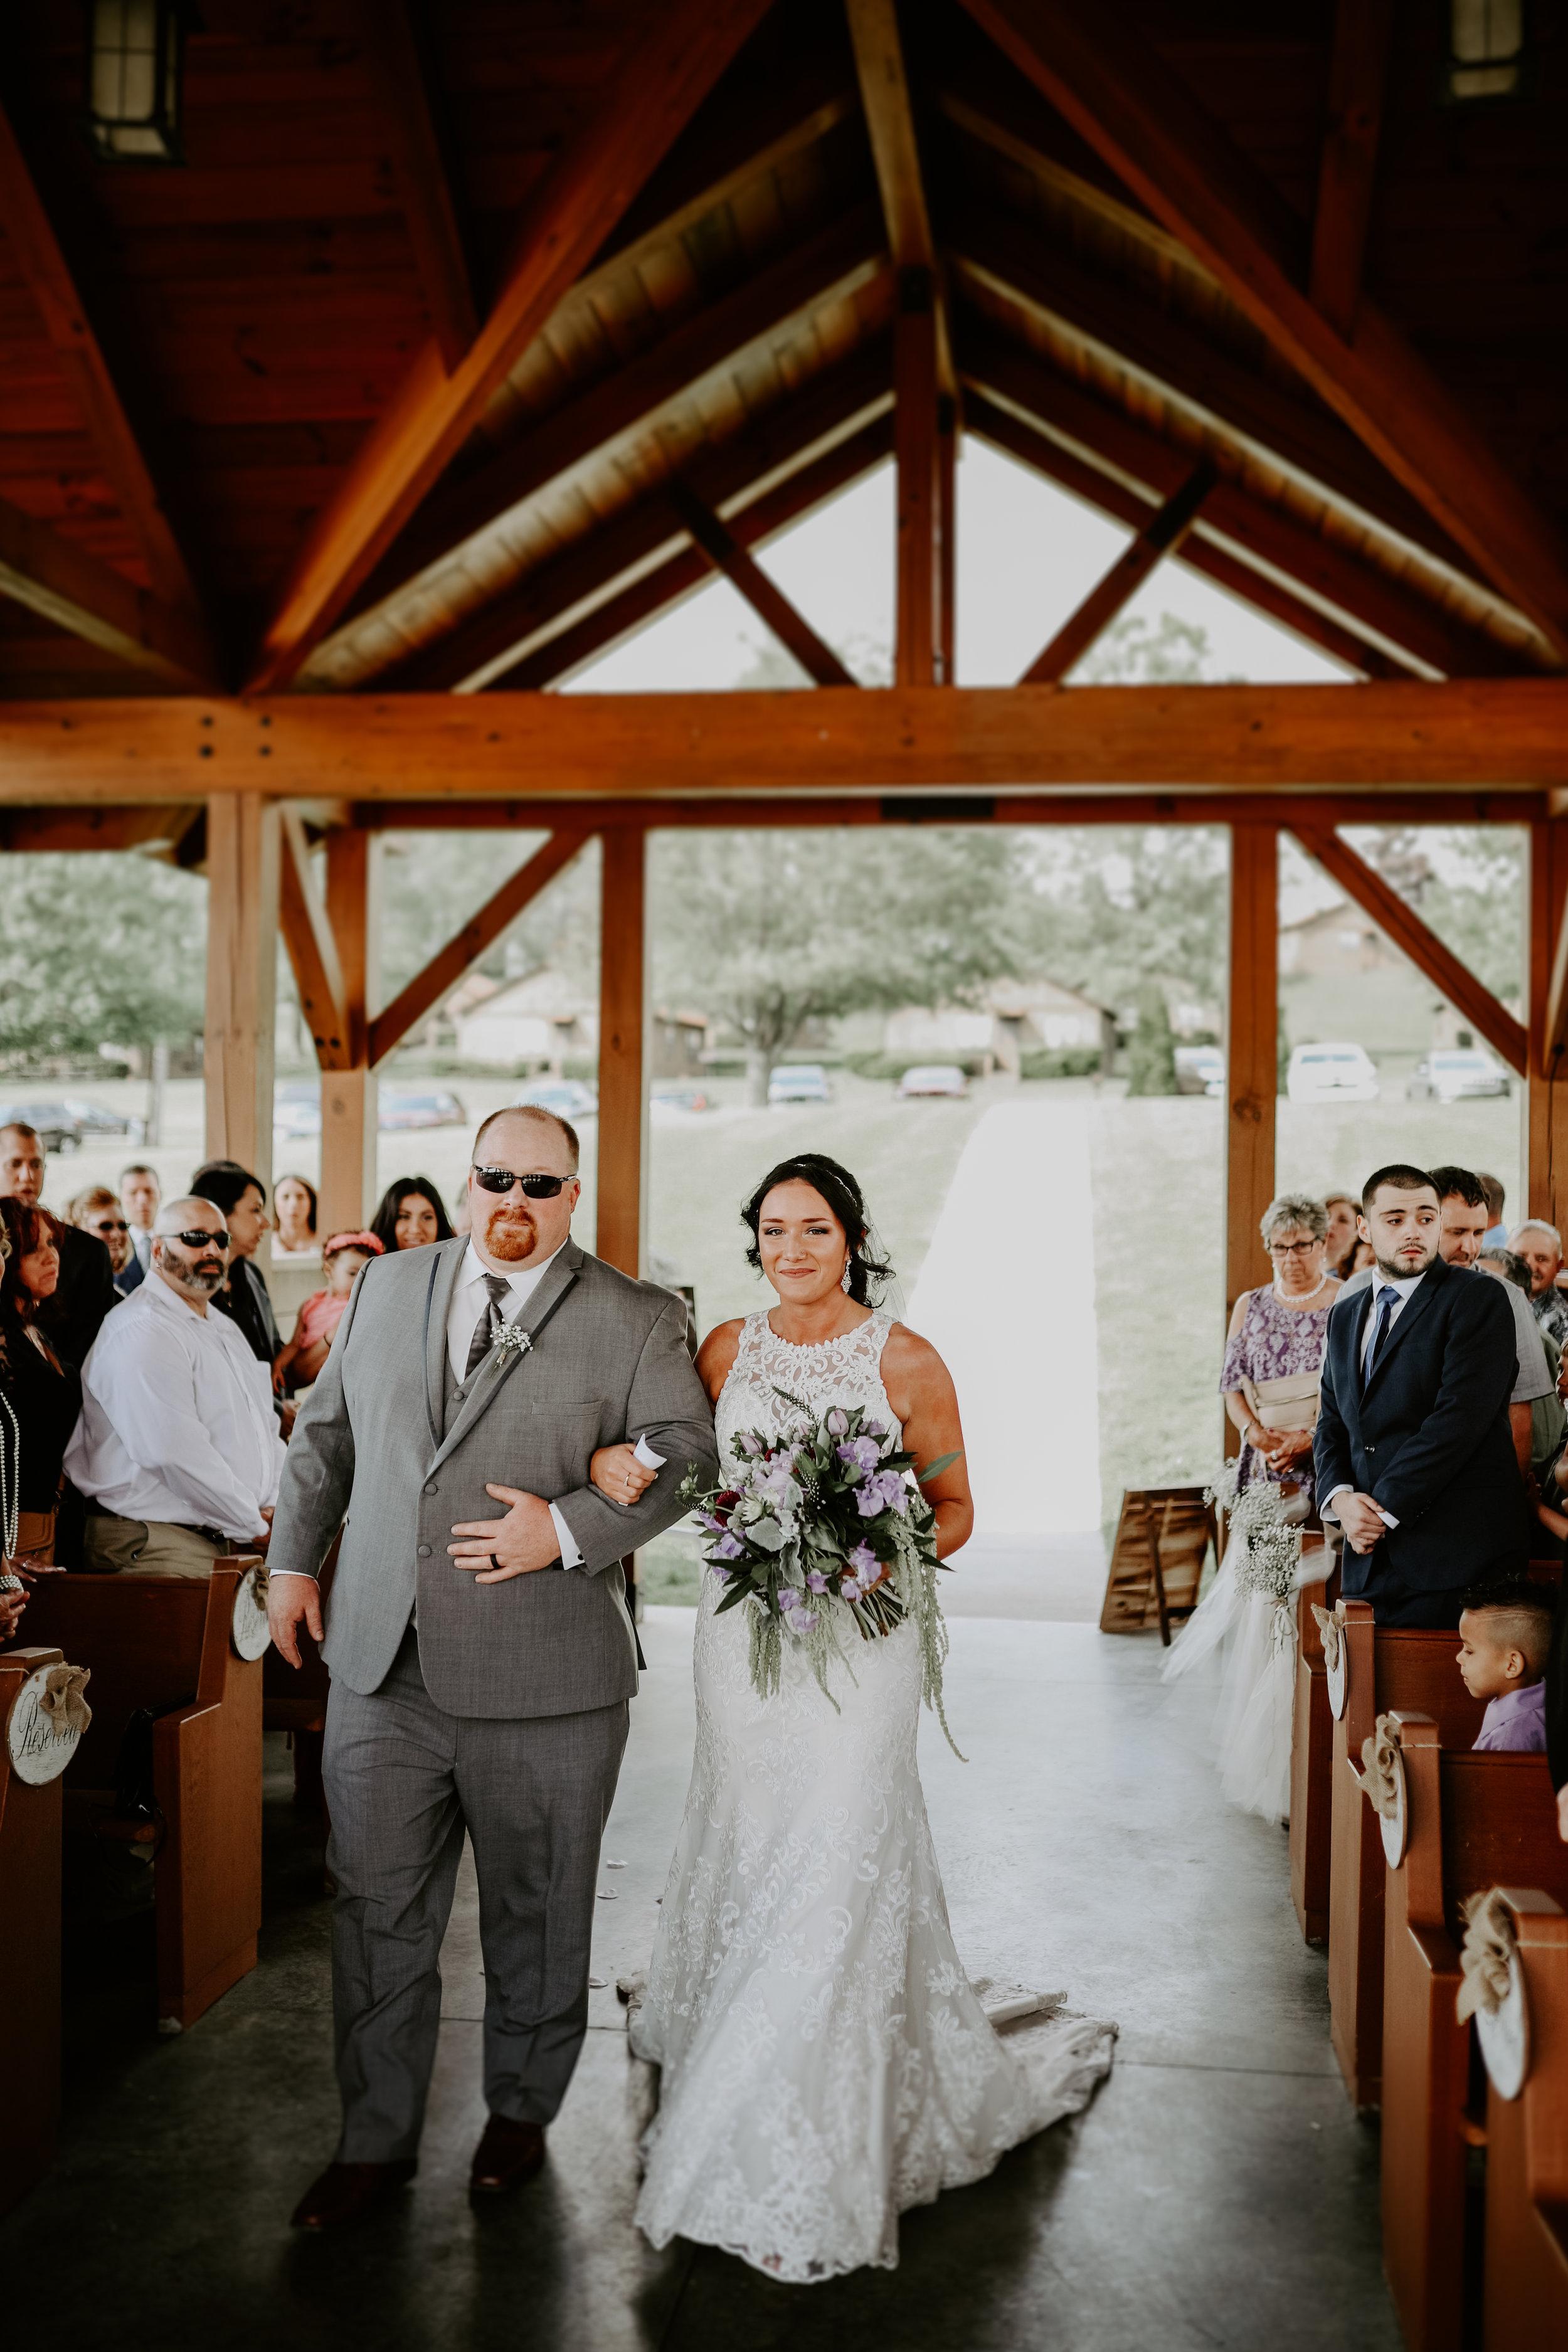 Kylei + Jordan Wedding 21 (1 of 1).jpg